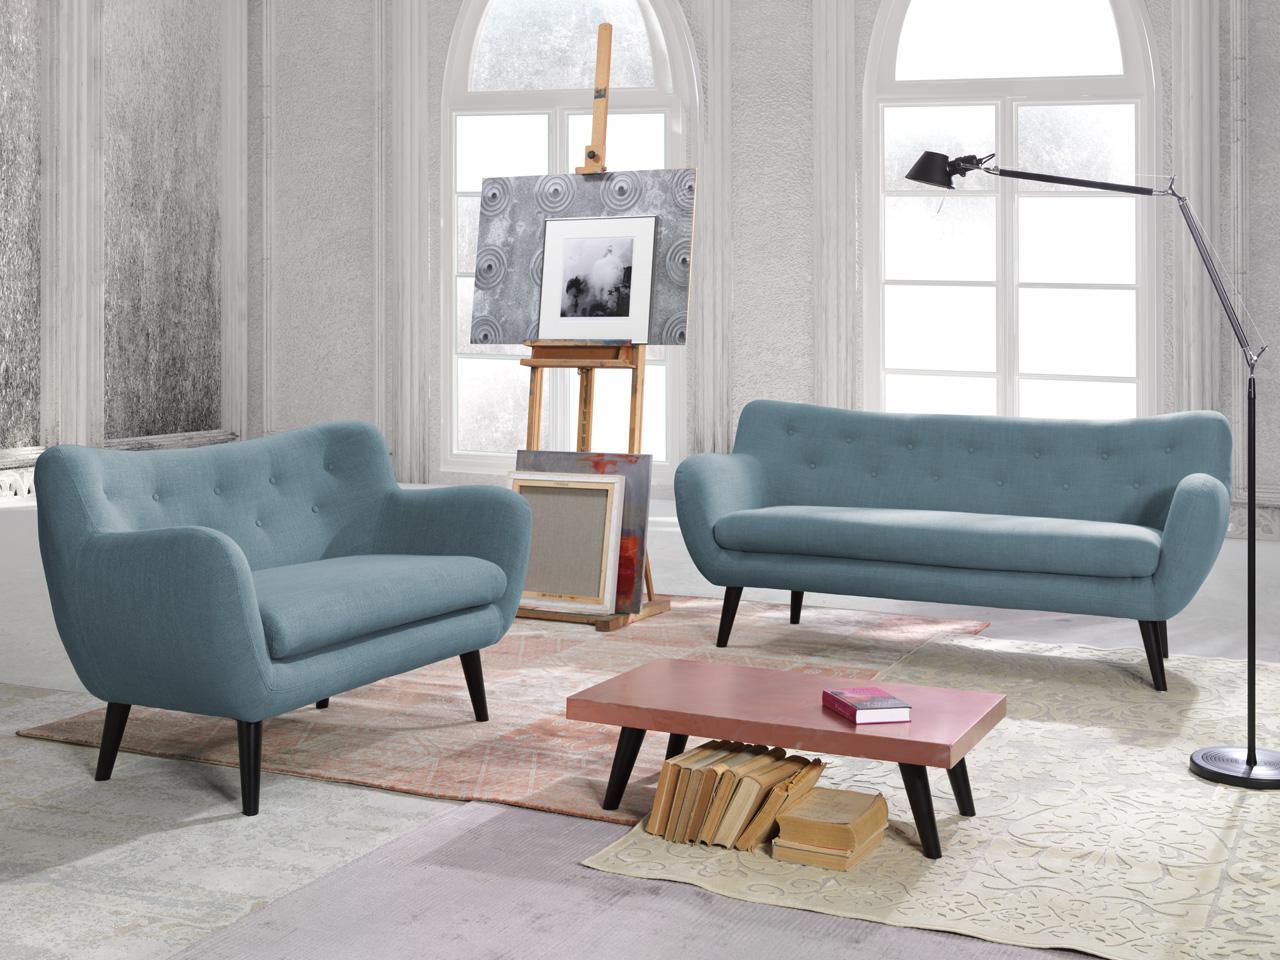 New Look Sofakombination 2 Teilig George Bestehend Aus 2 Sitzer 3